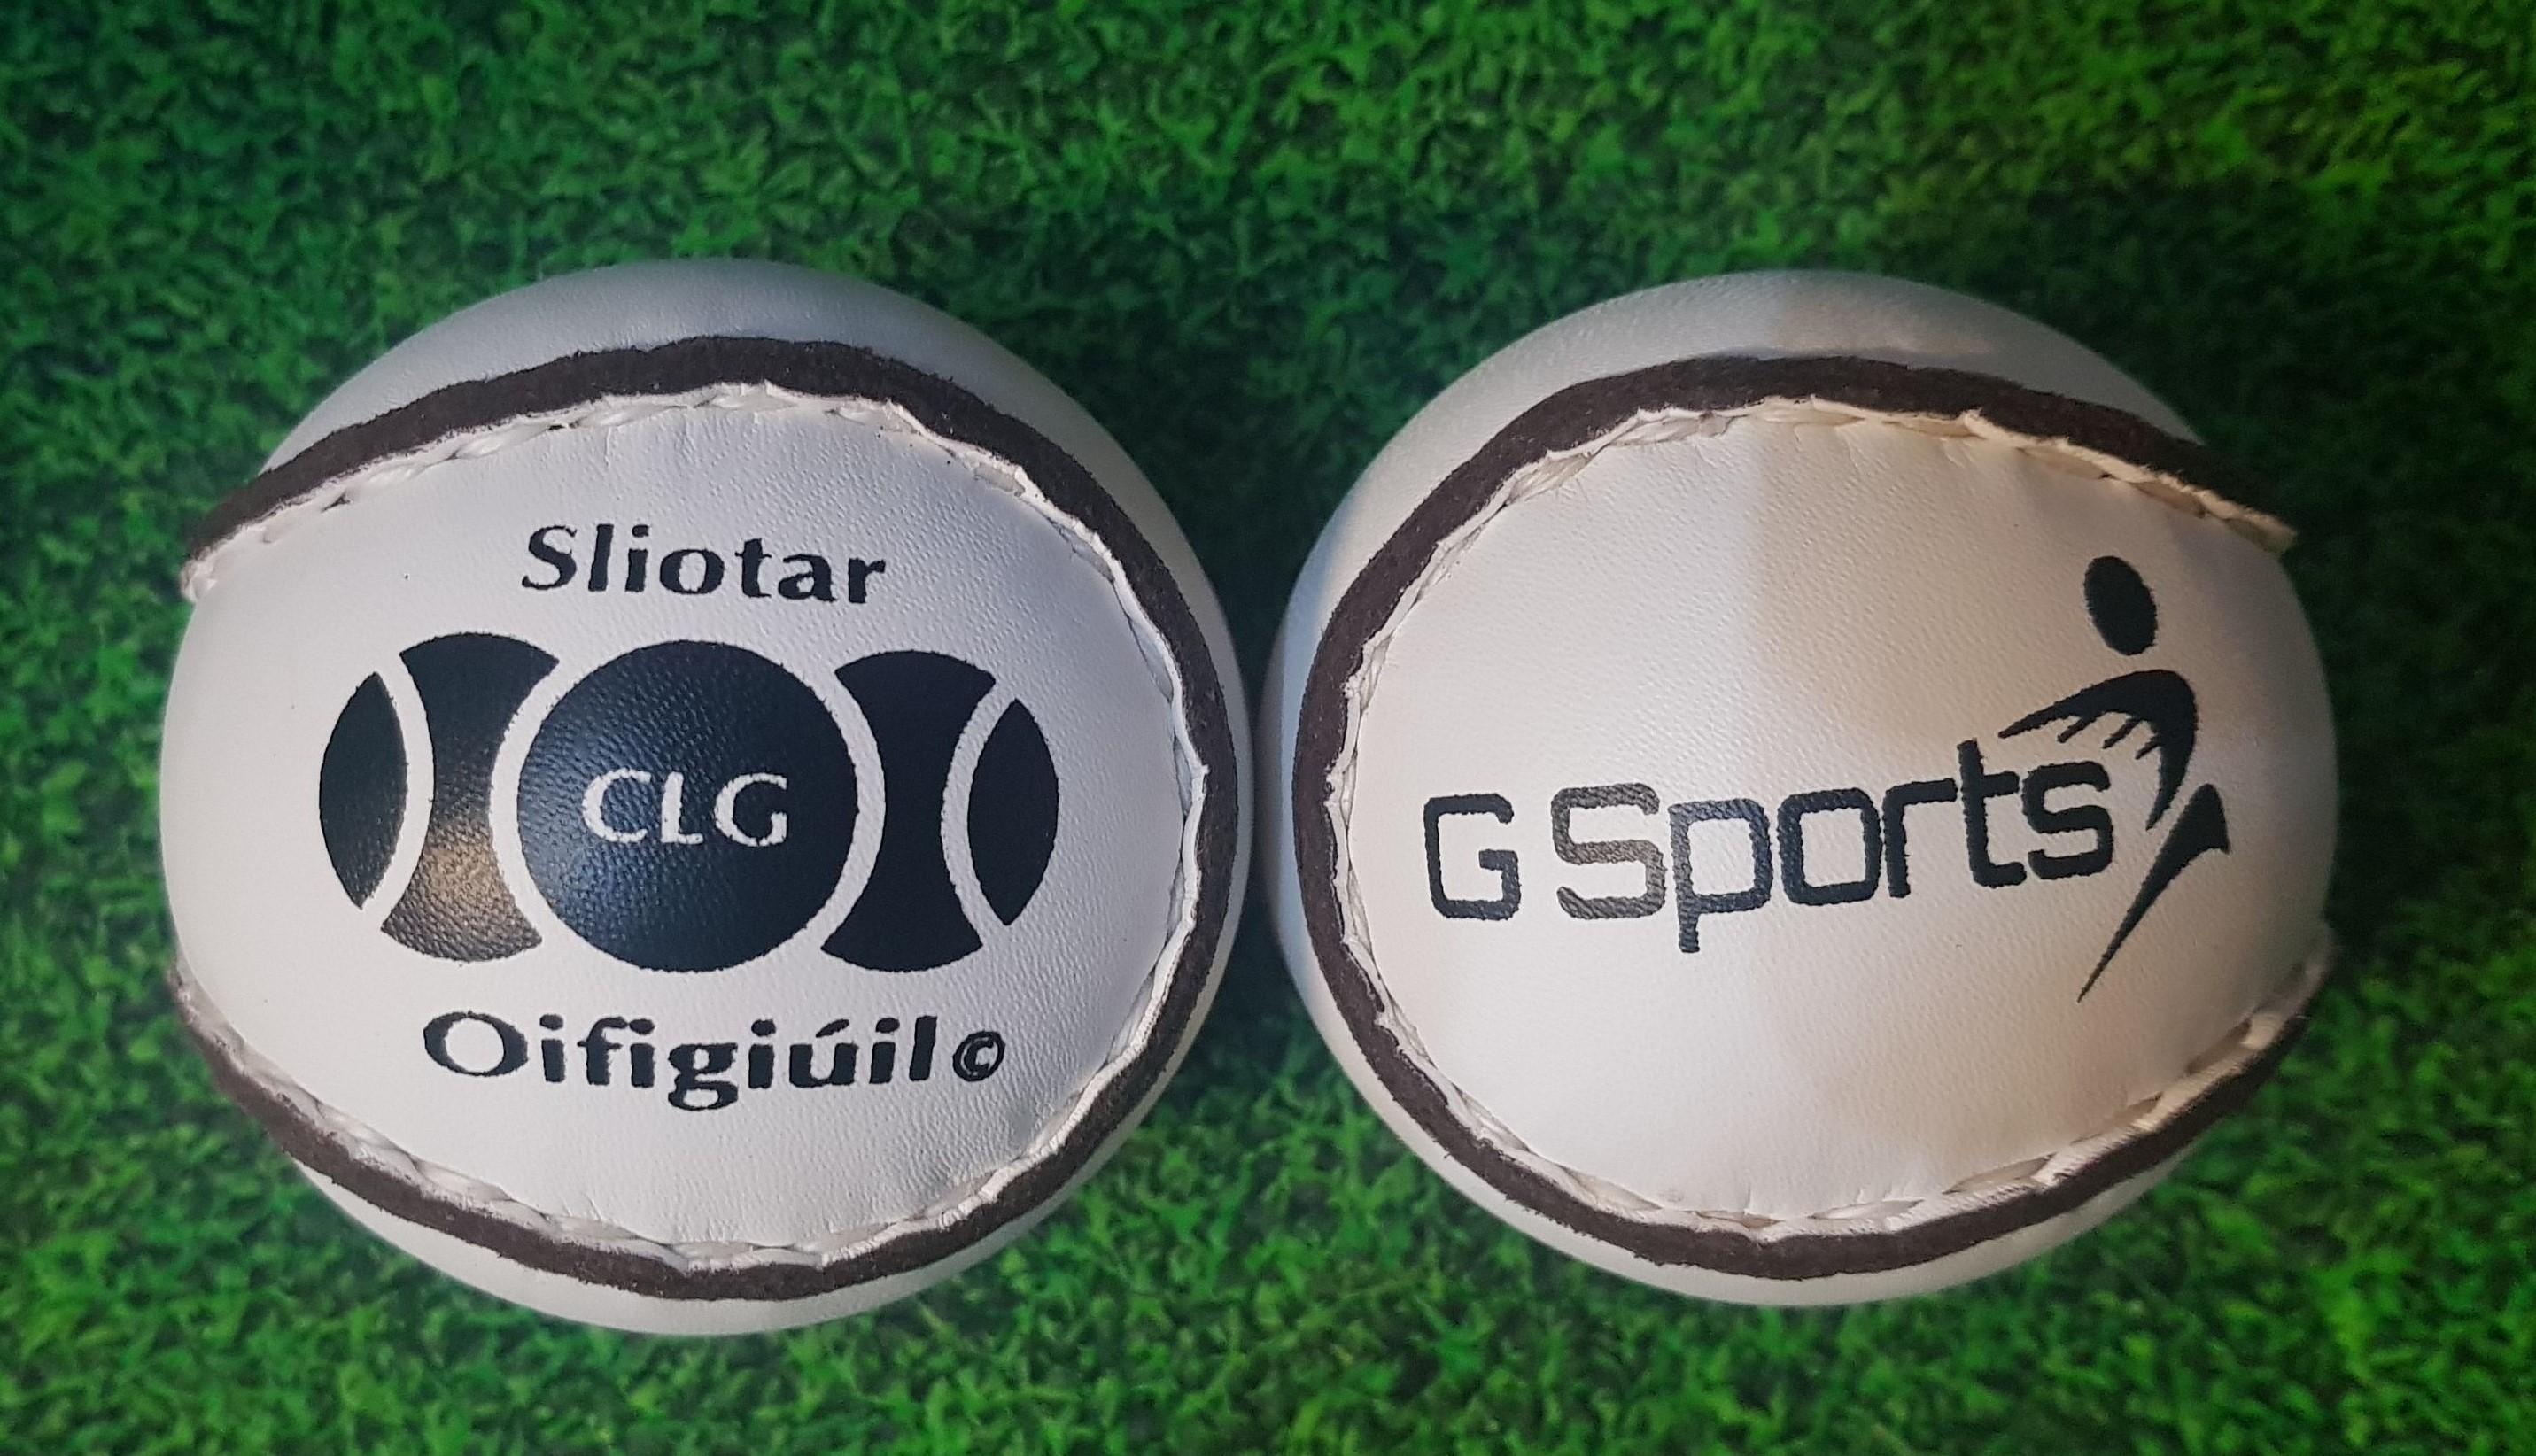 G Sports Match Sliotar Size 4 Image